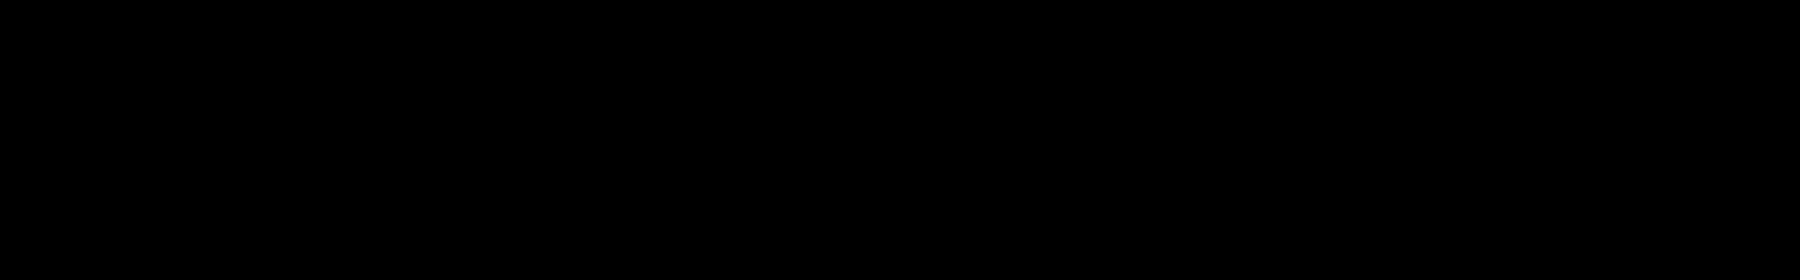 Analogue House audio waveform